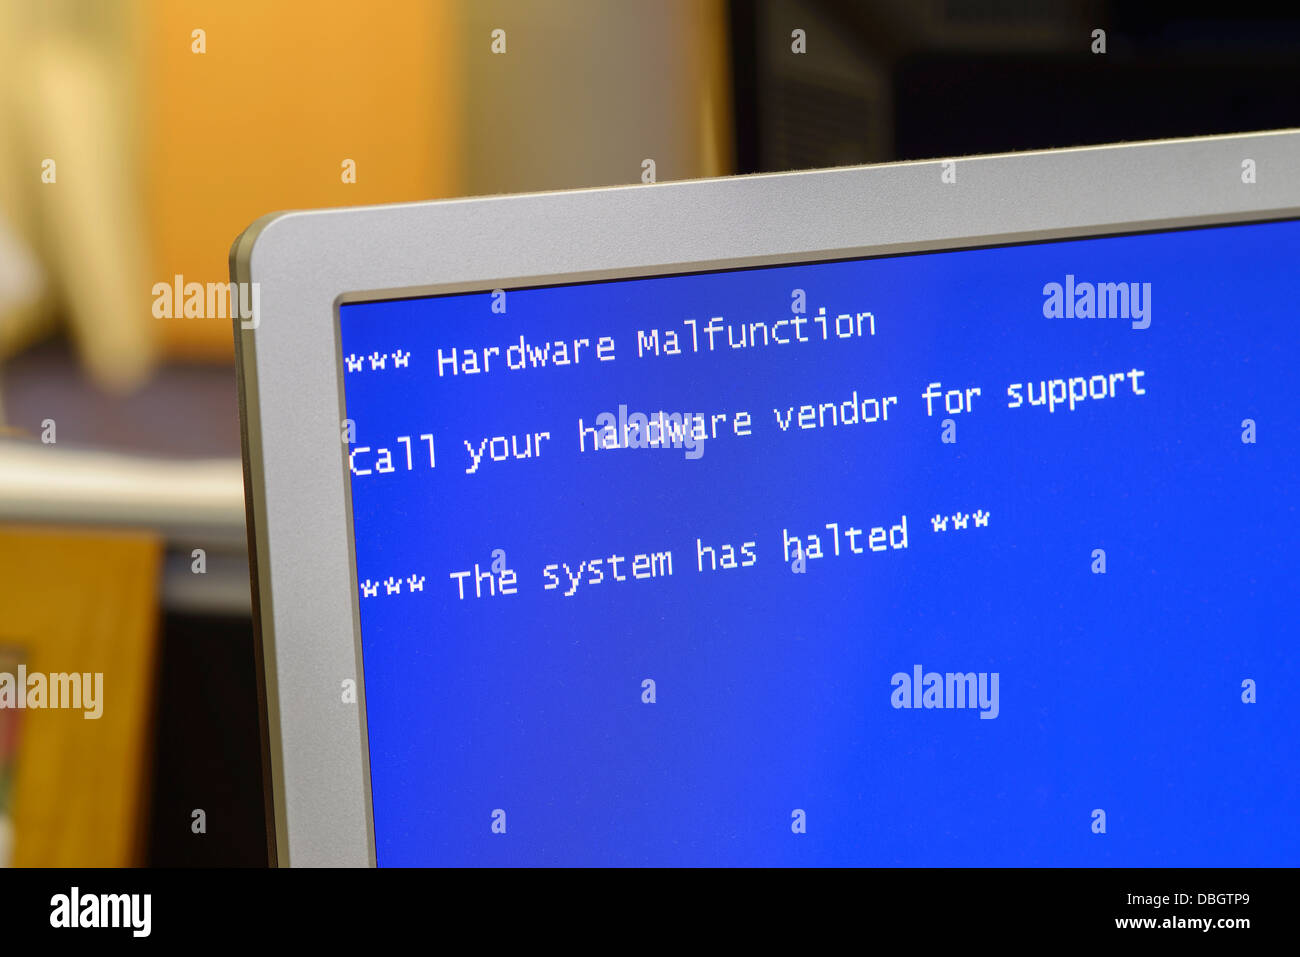 Hardware Malfunction computer error message - Stock Image